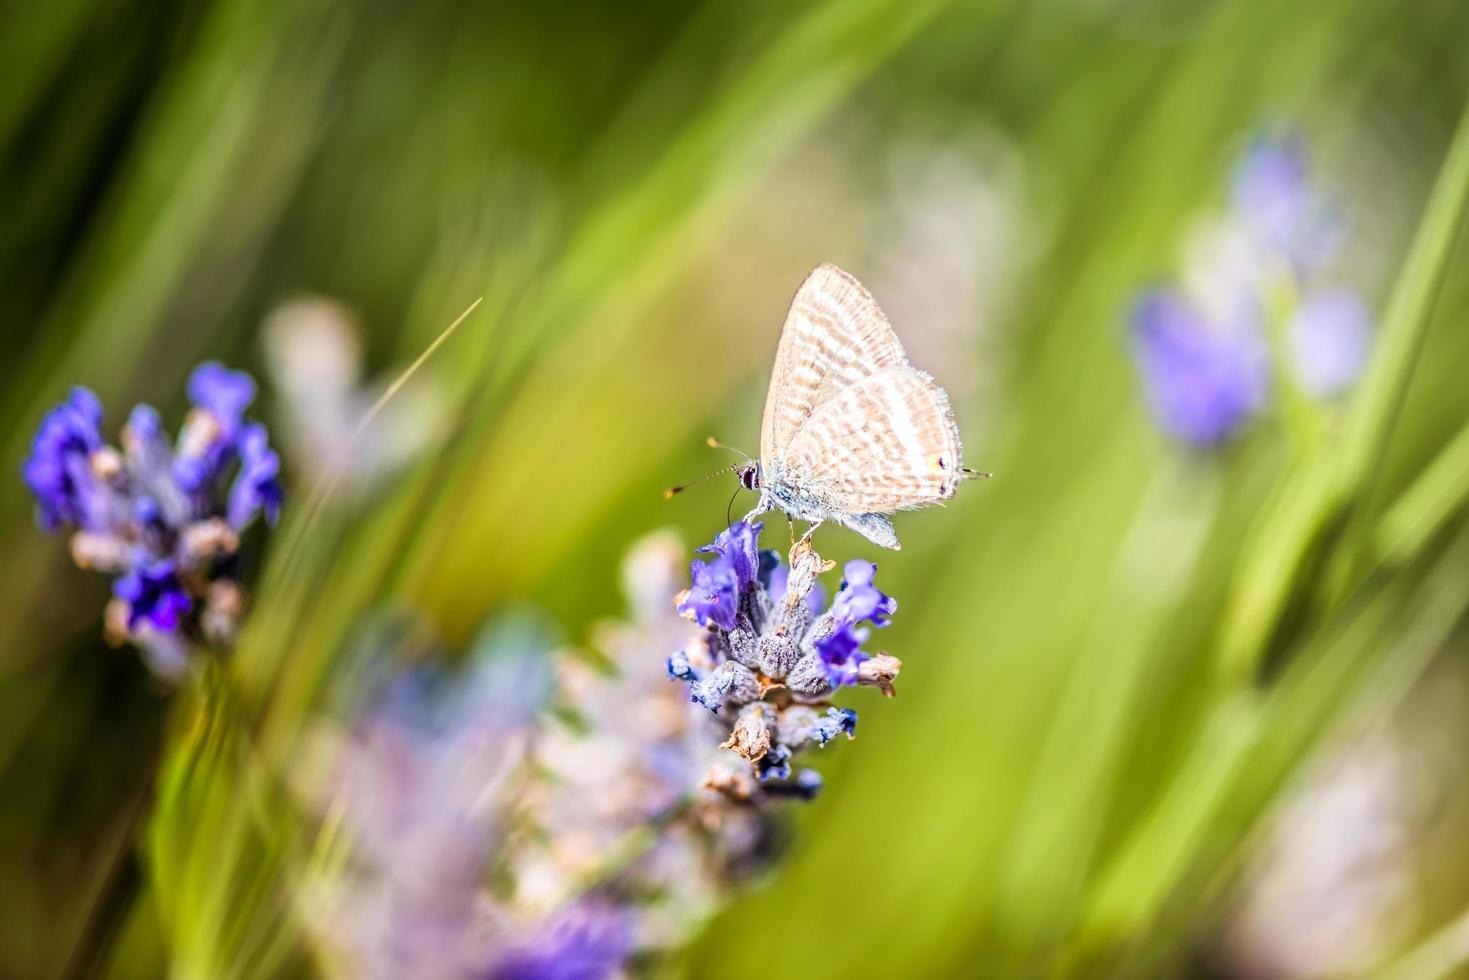 vlinder tussen lavendelbloemen en stengels foto